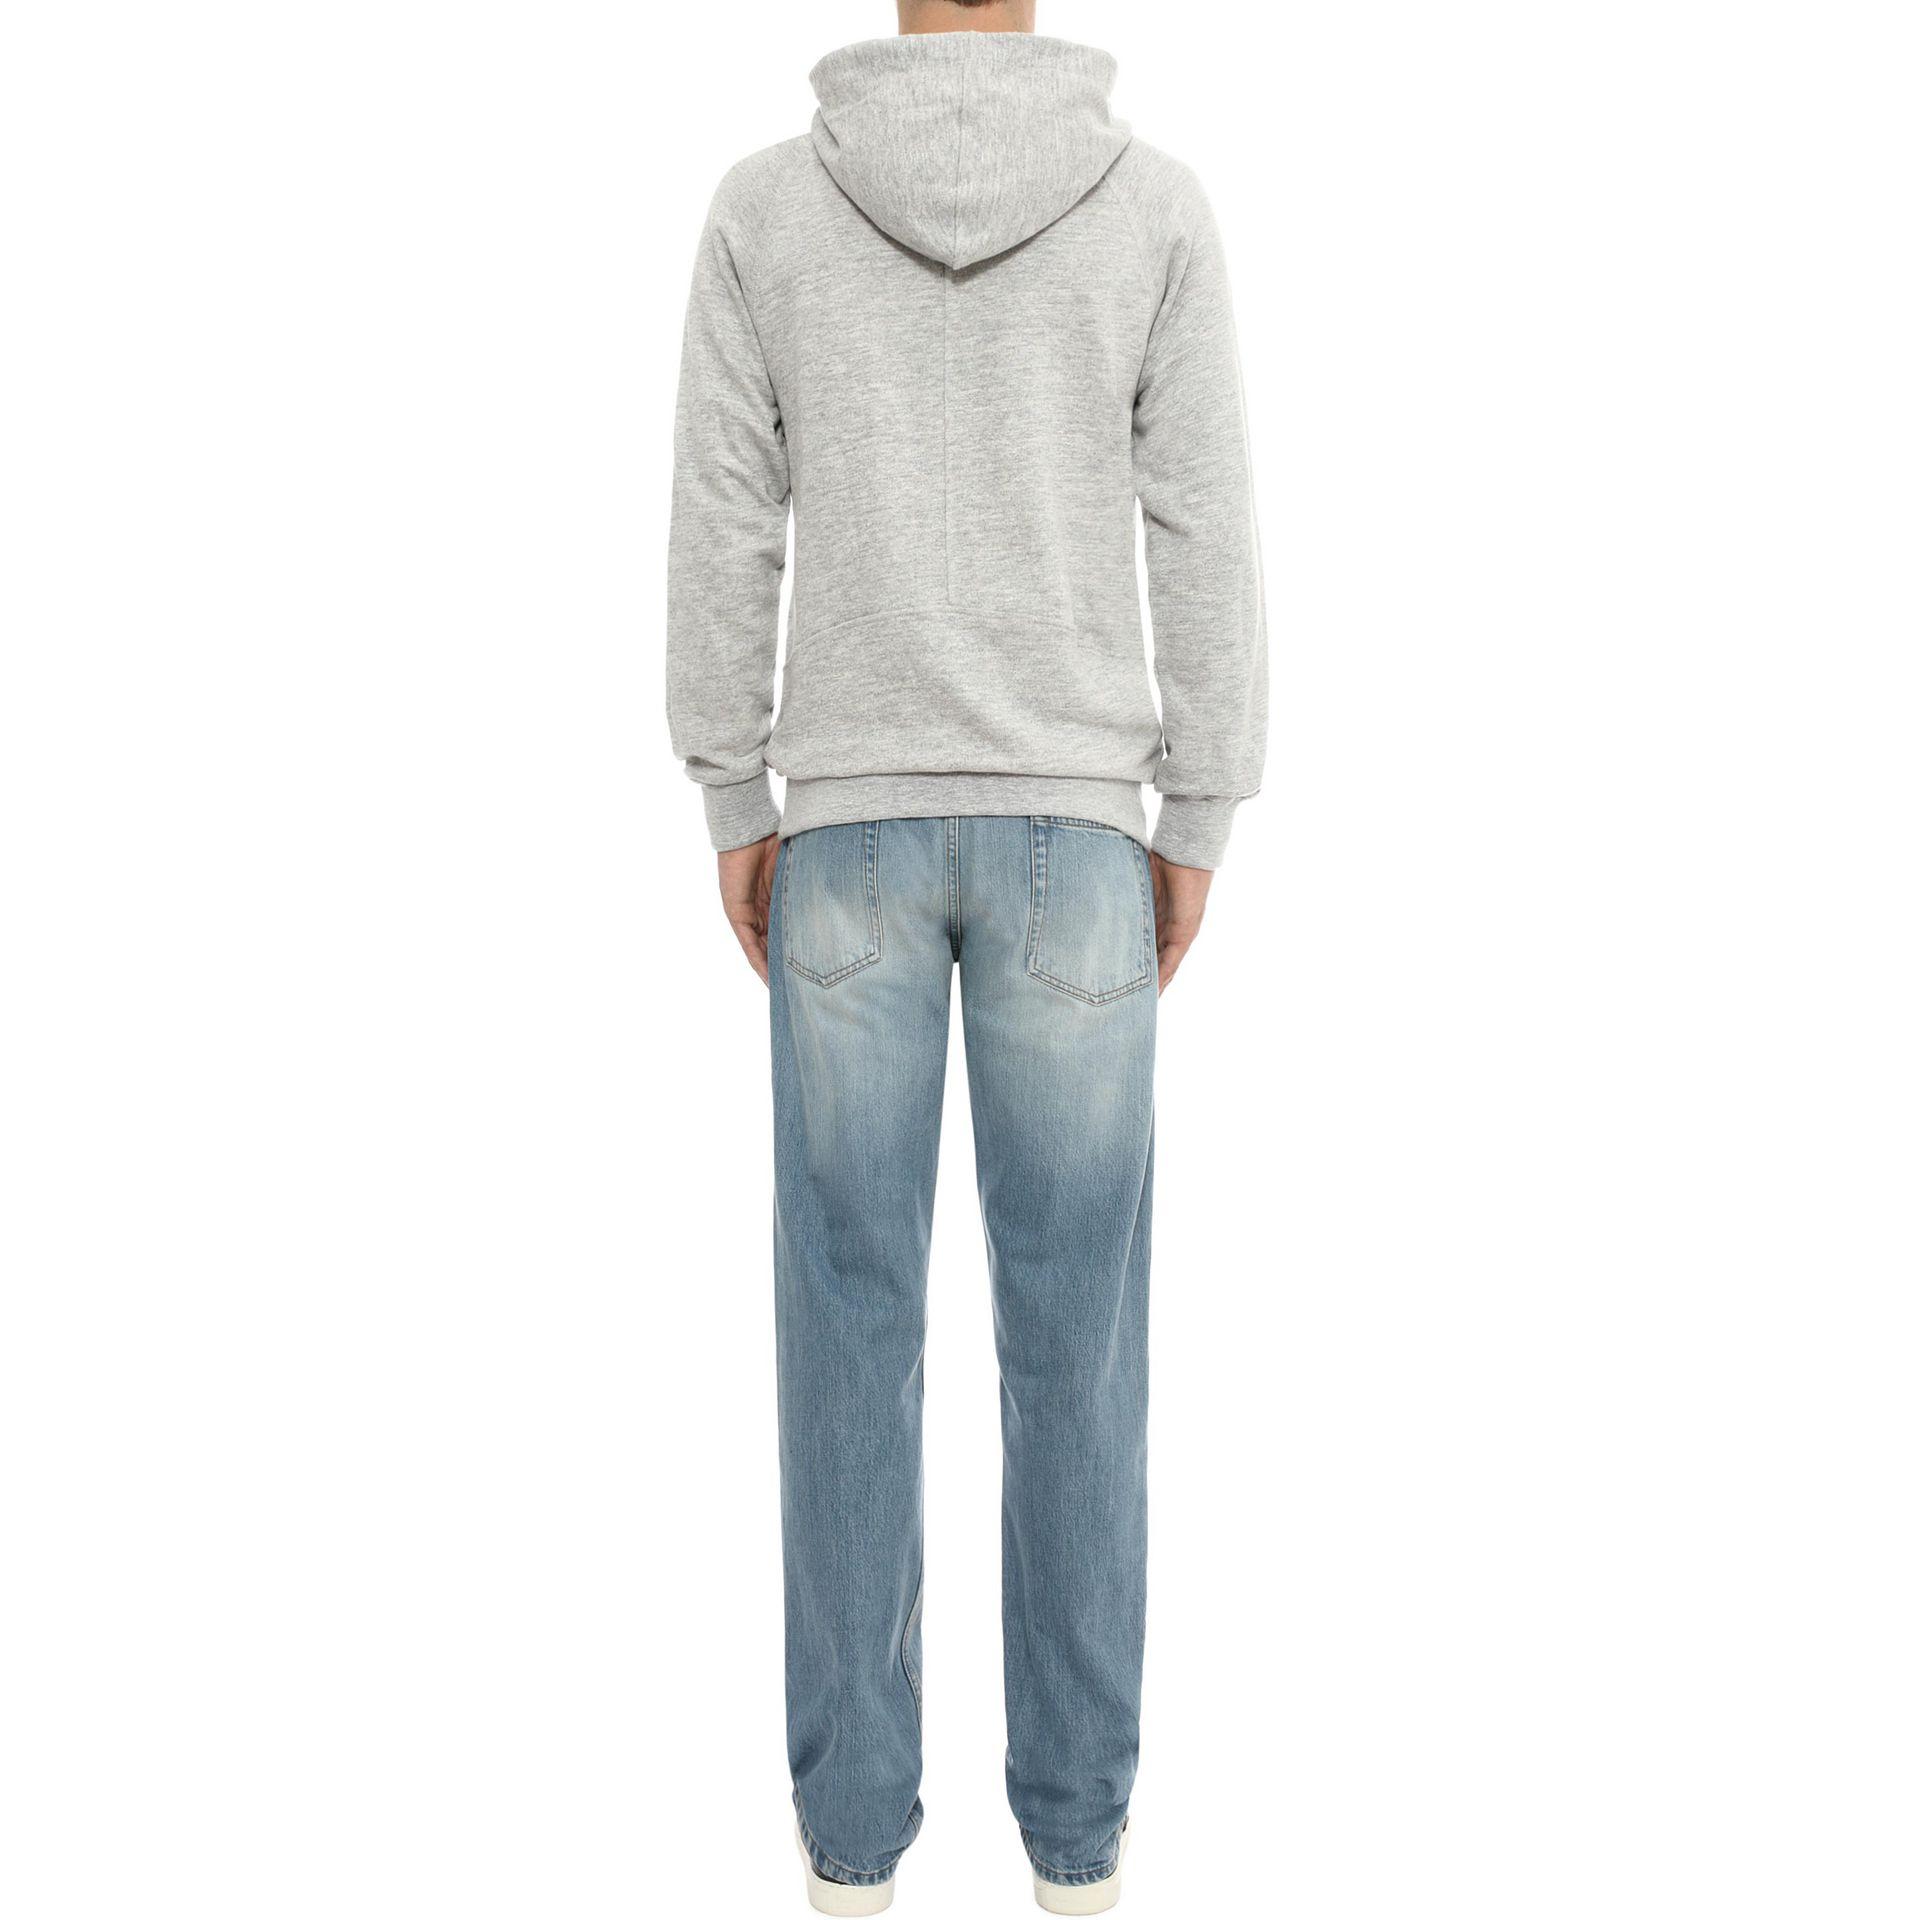 alexander mcqueen asymmetric zip up hooded sweatshirt in gray lyst. Black Bedroom Furniture Sets. Home Design Ideas